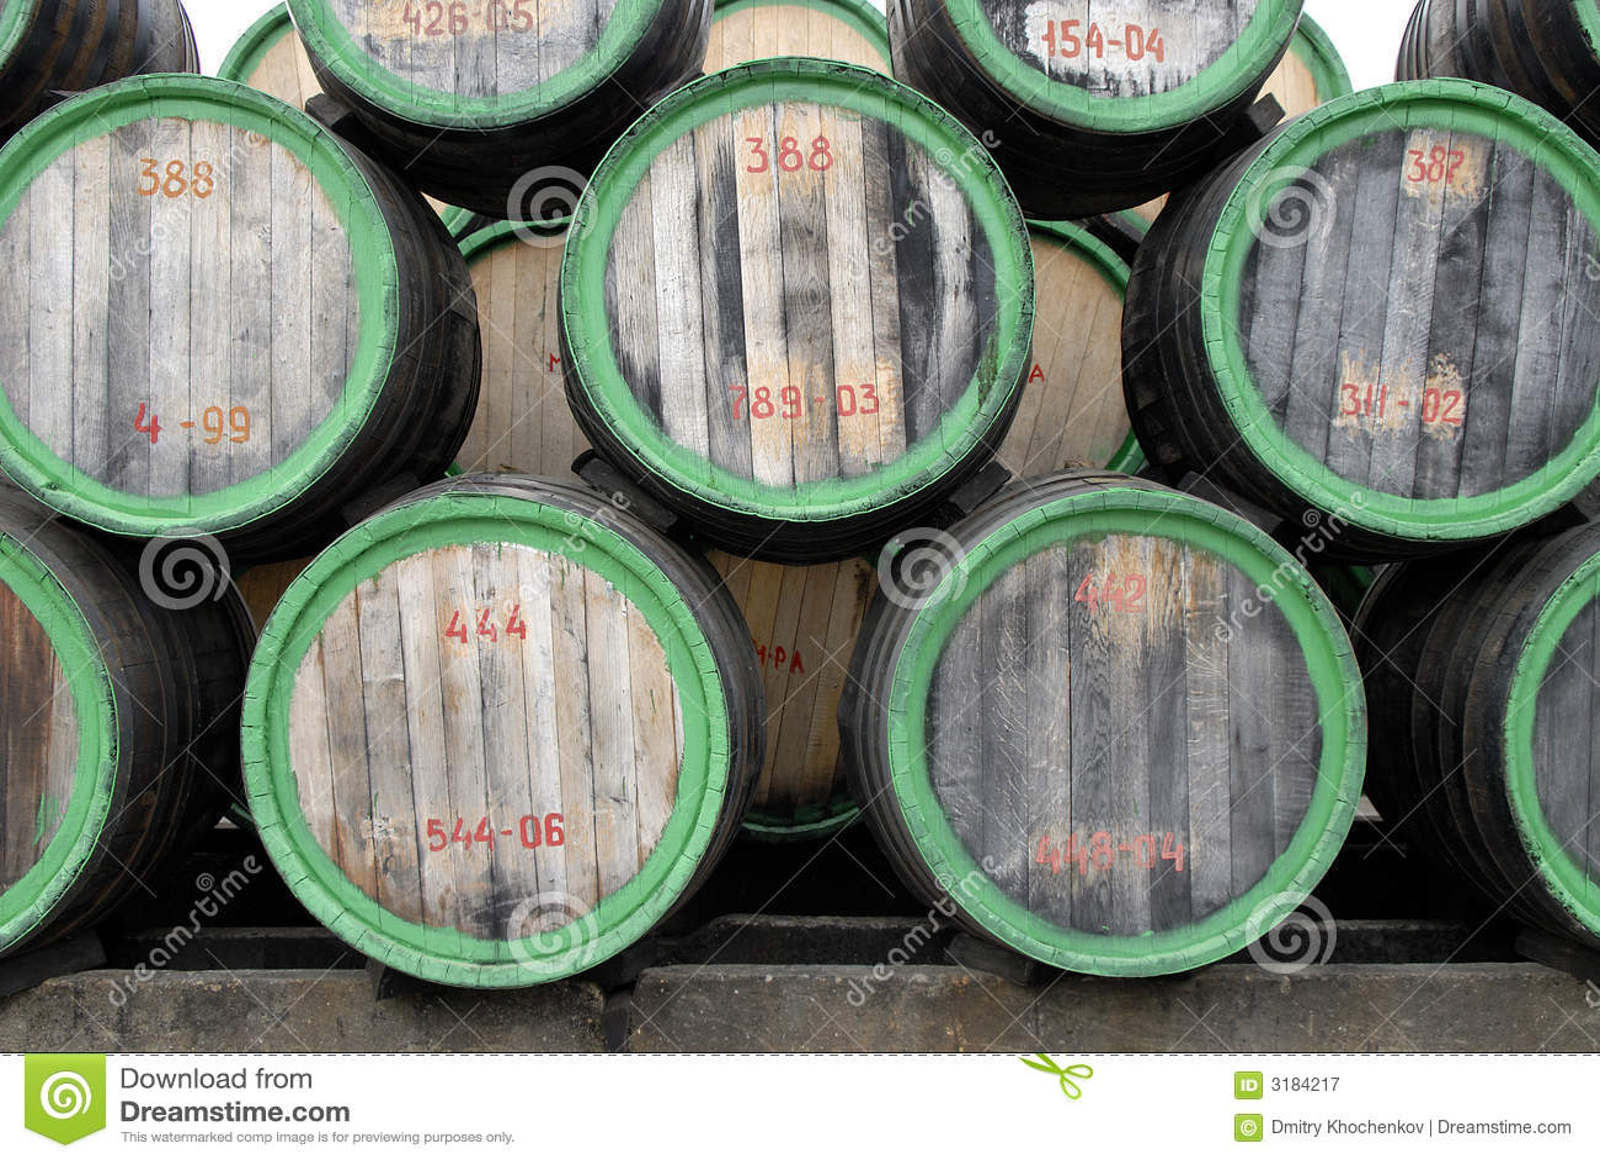 Twarz z beczki wina lasu.